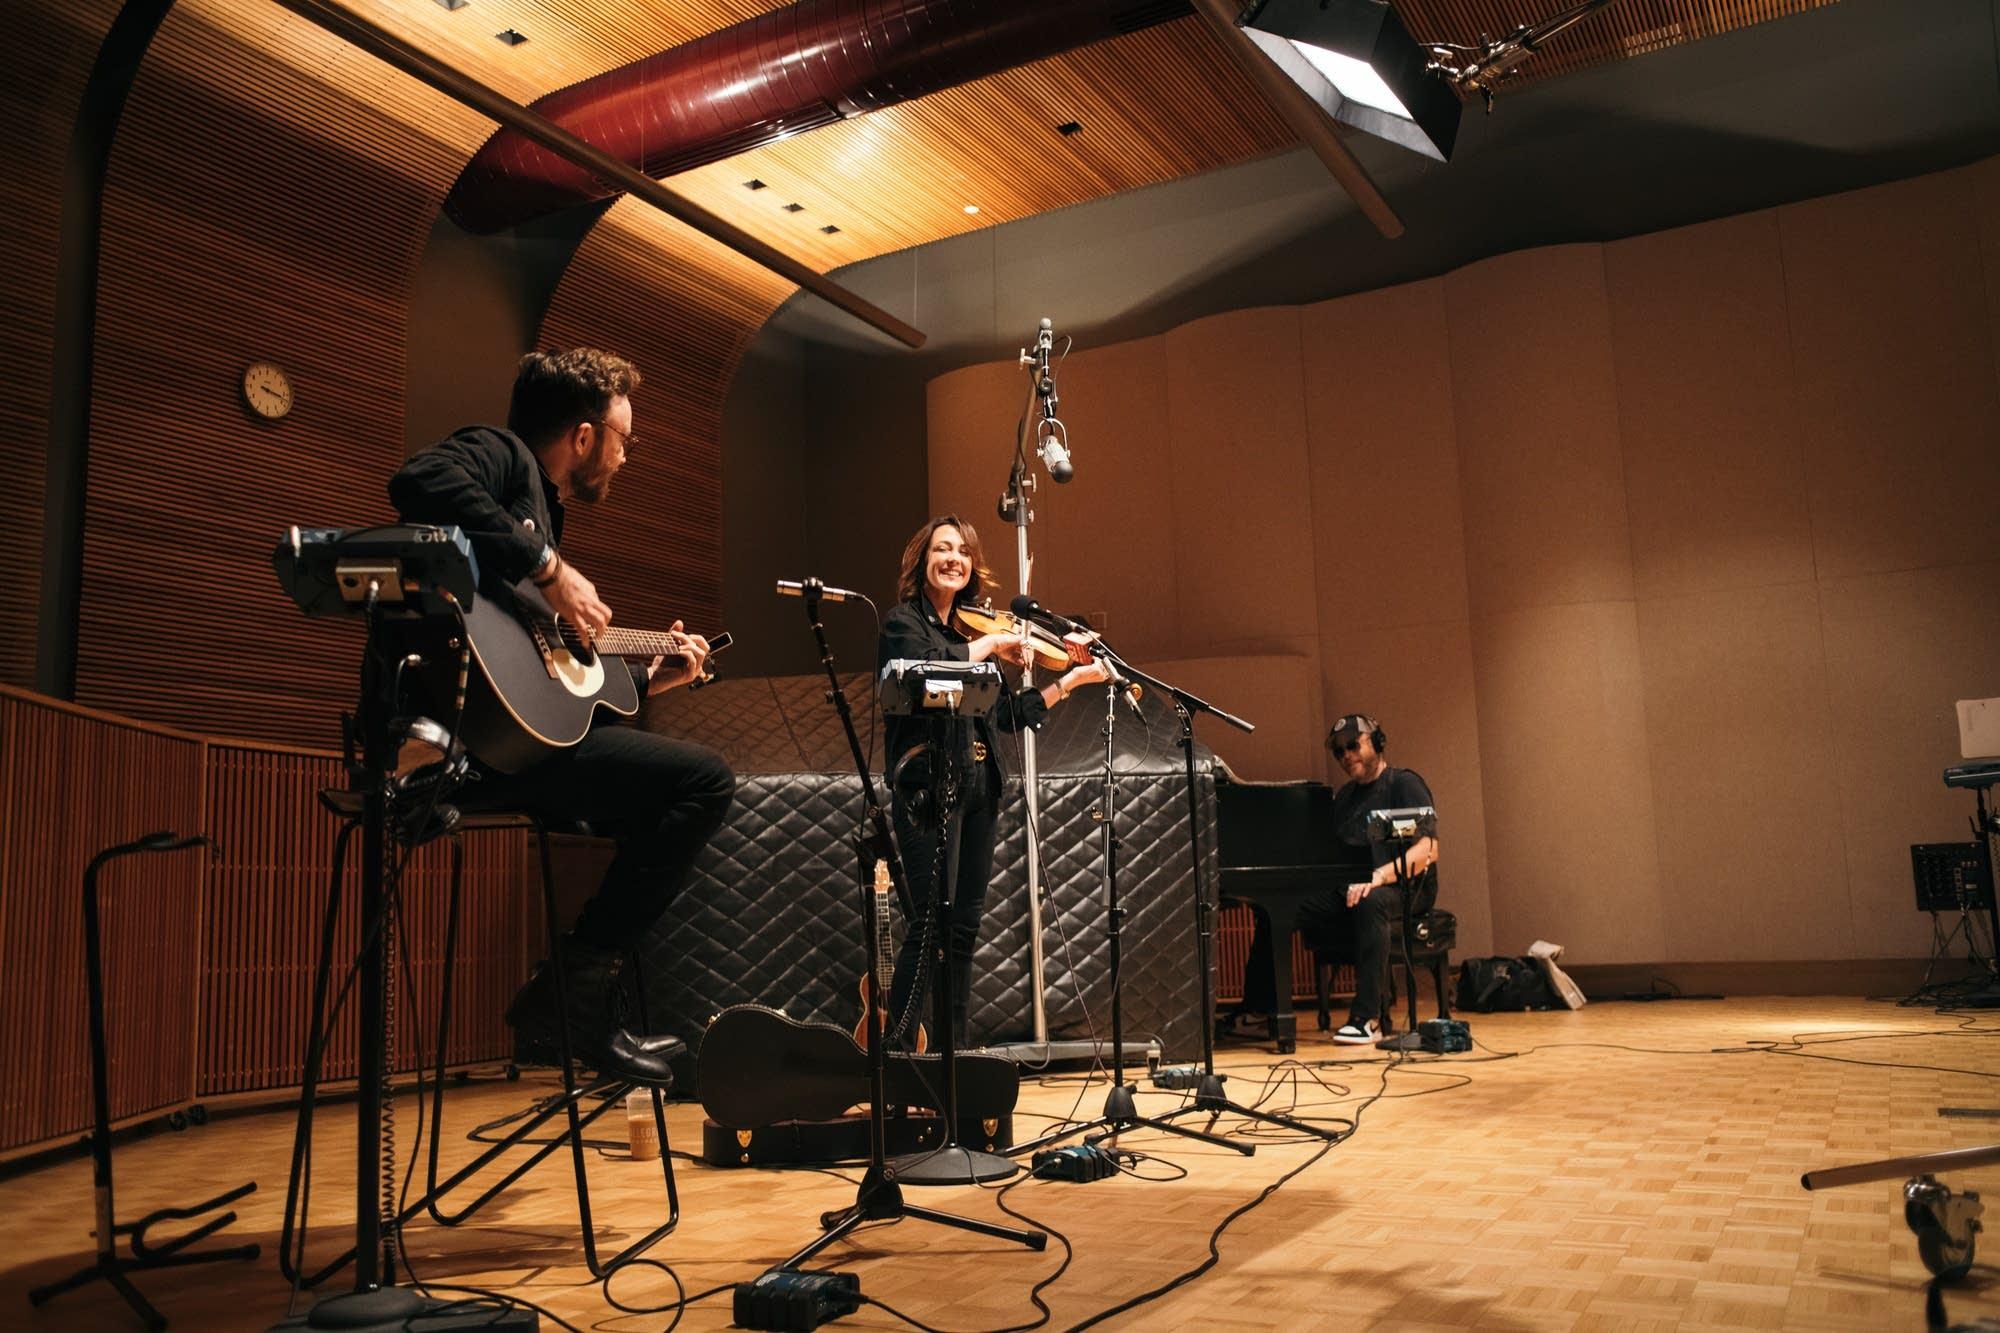 Amanda Shires performs in The Current studio